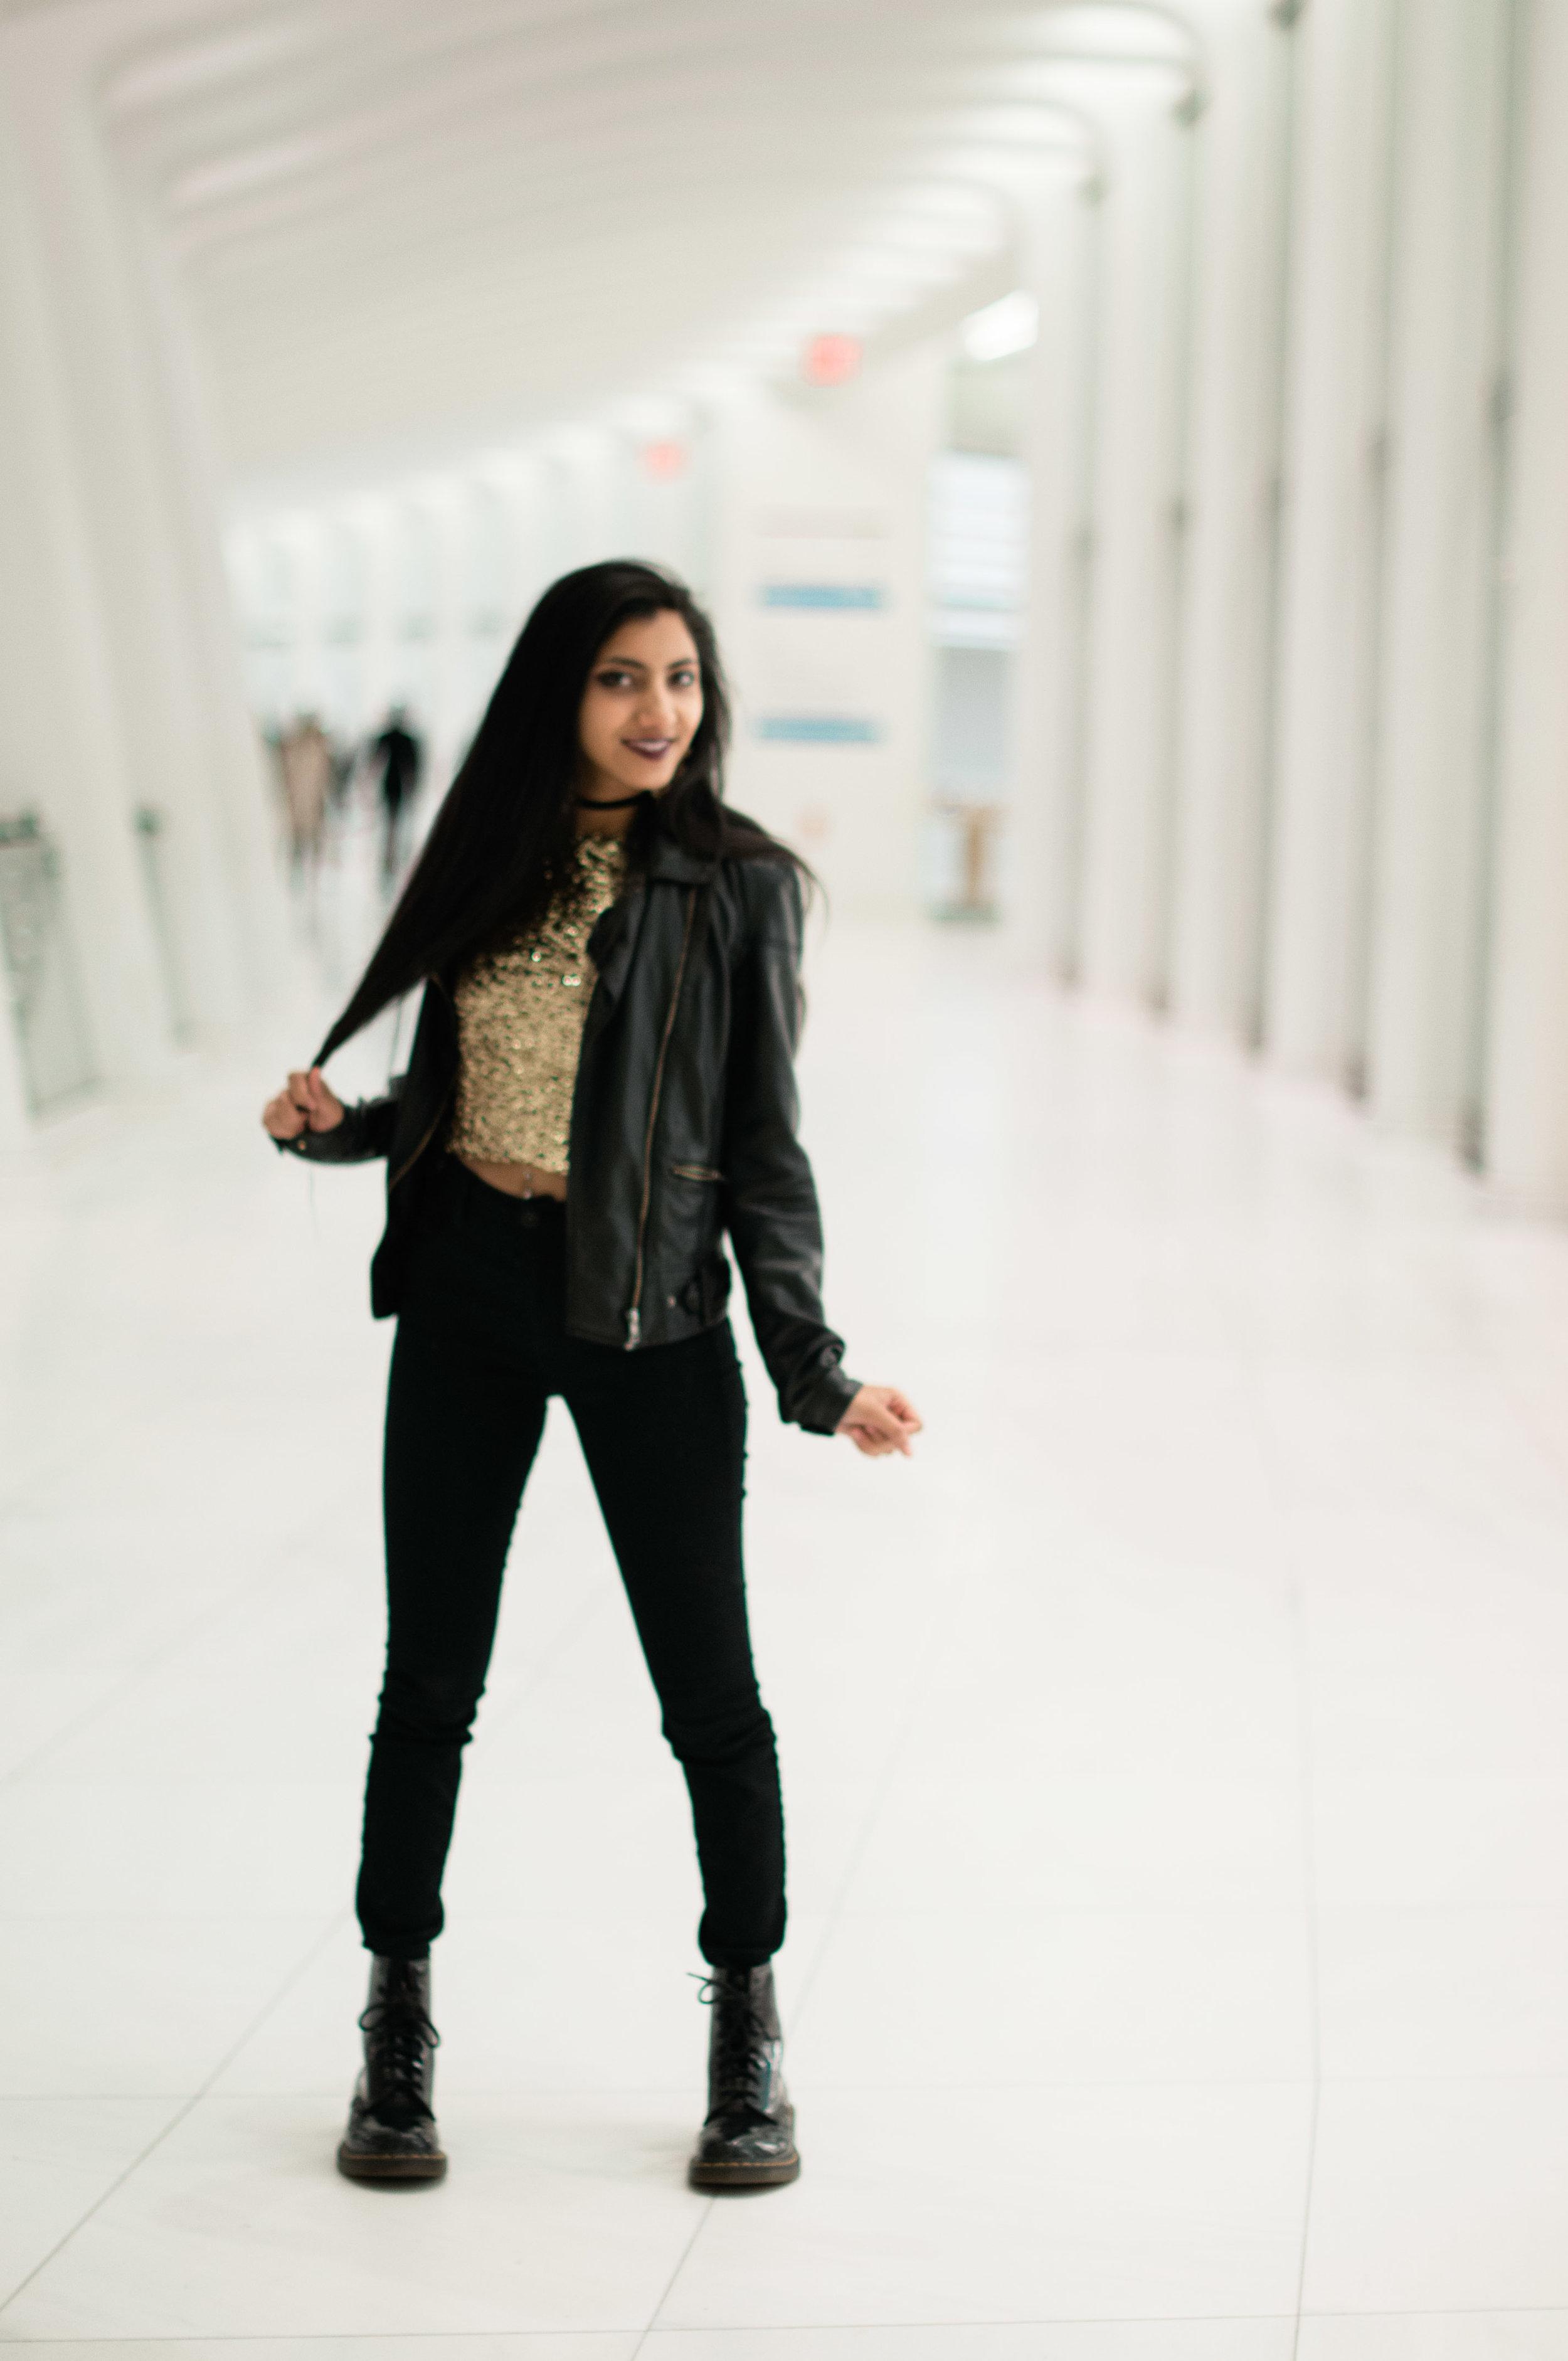 zafiahmed.renaissancezafi.fashionblogger.nycphotographer.oculus.nyc.mensfashion.nye.suit.lifestyle.-3.jpg